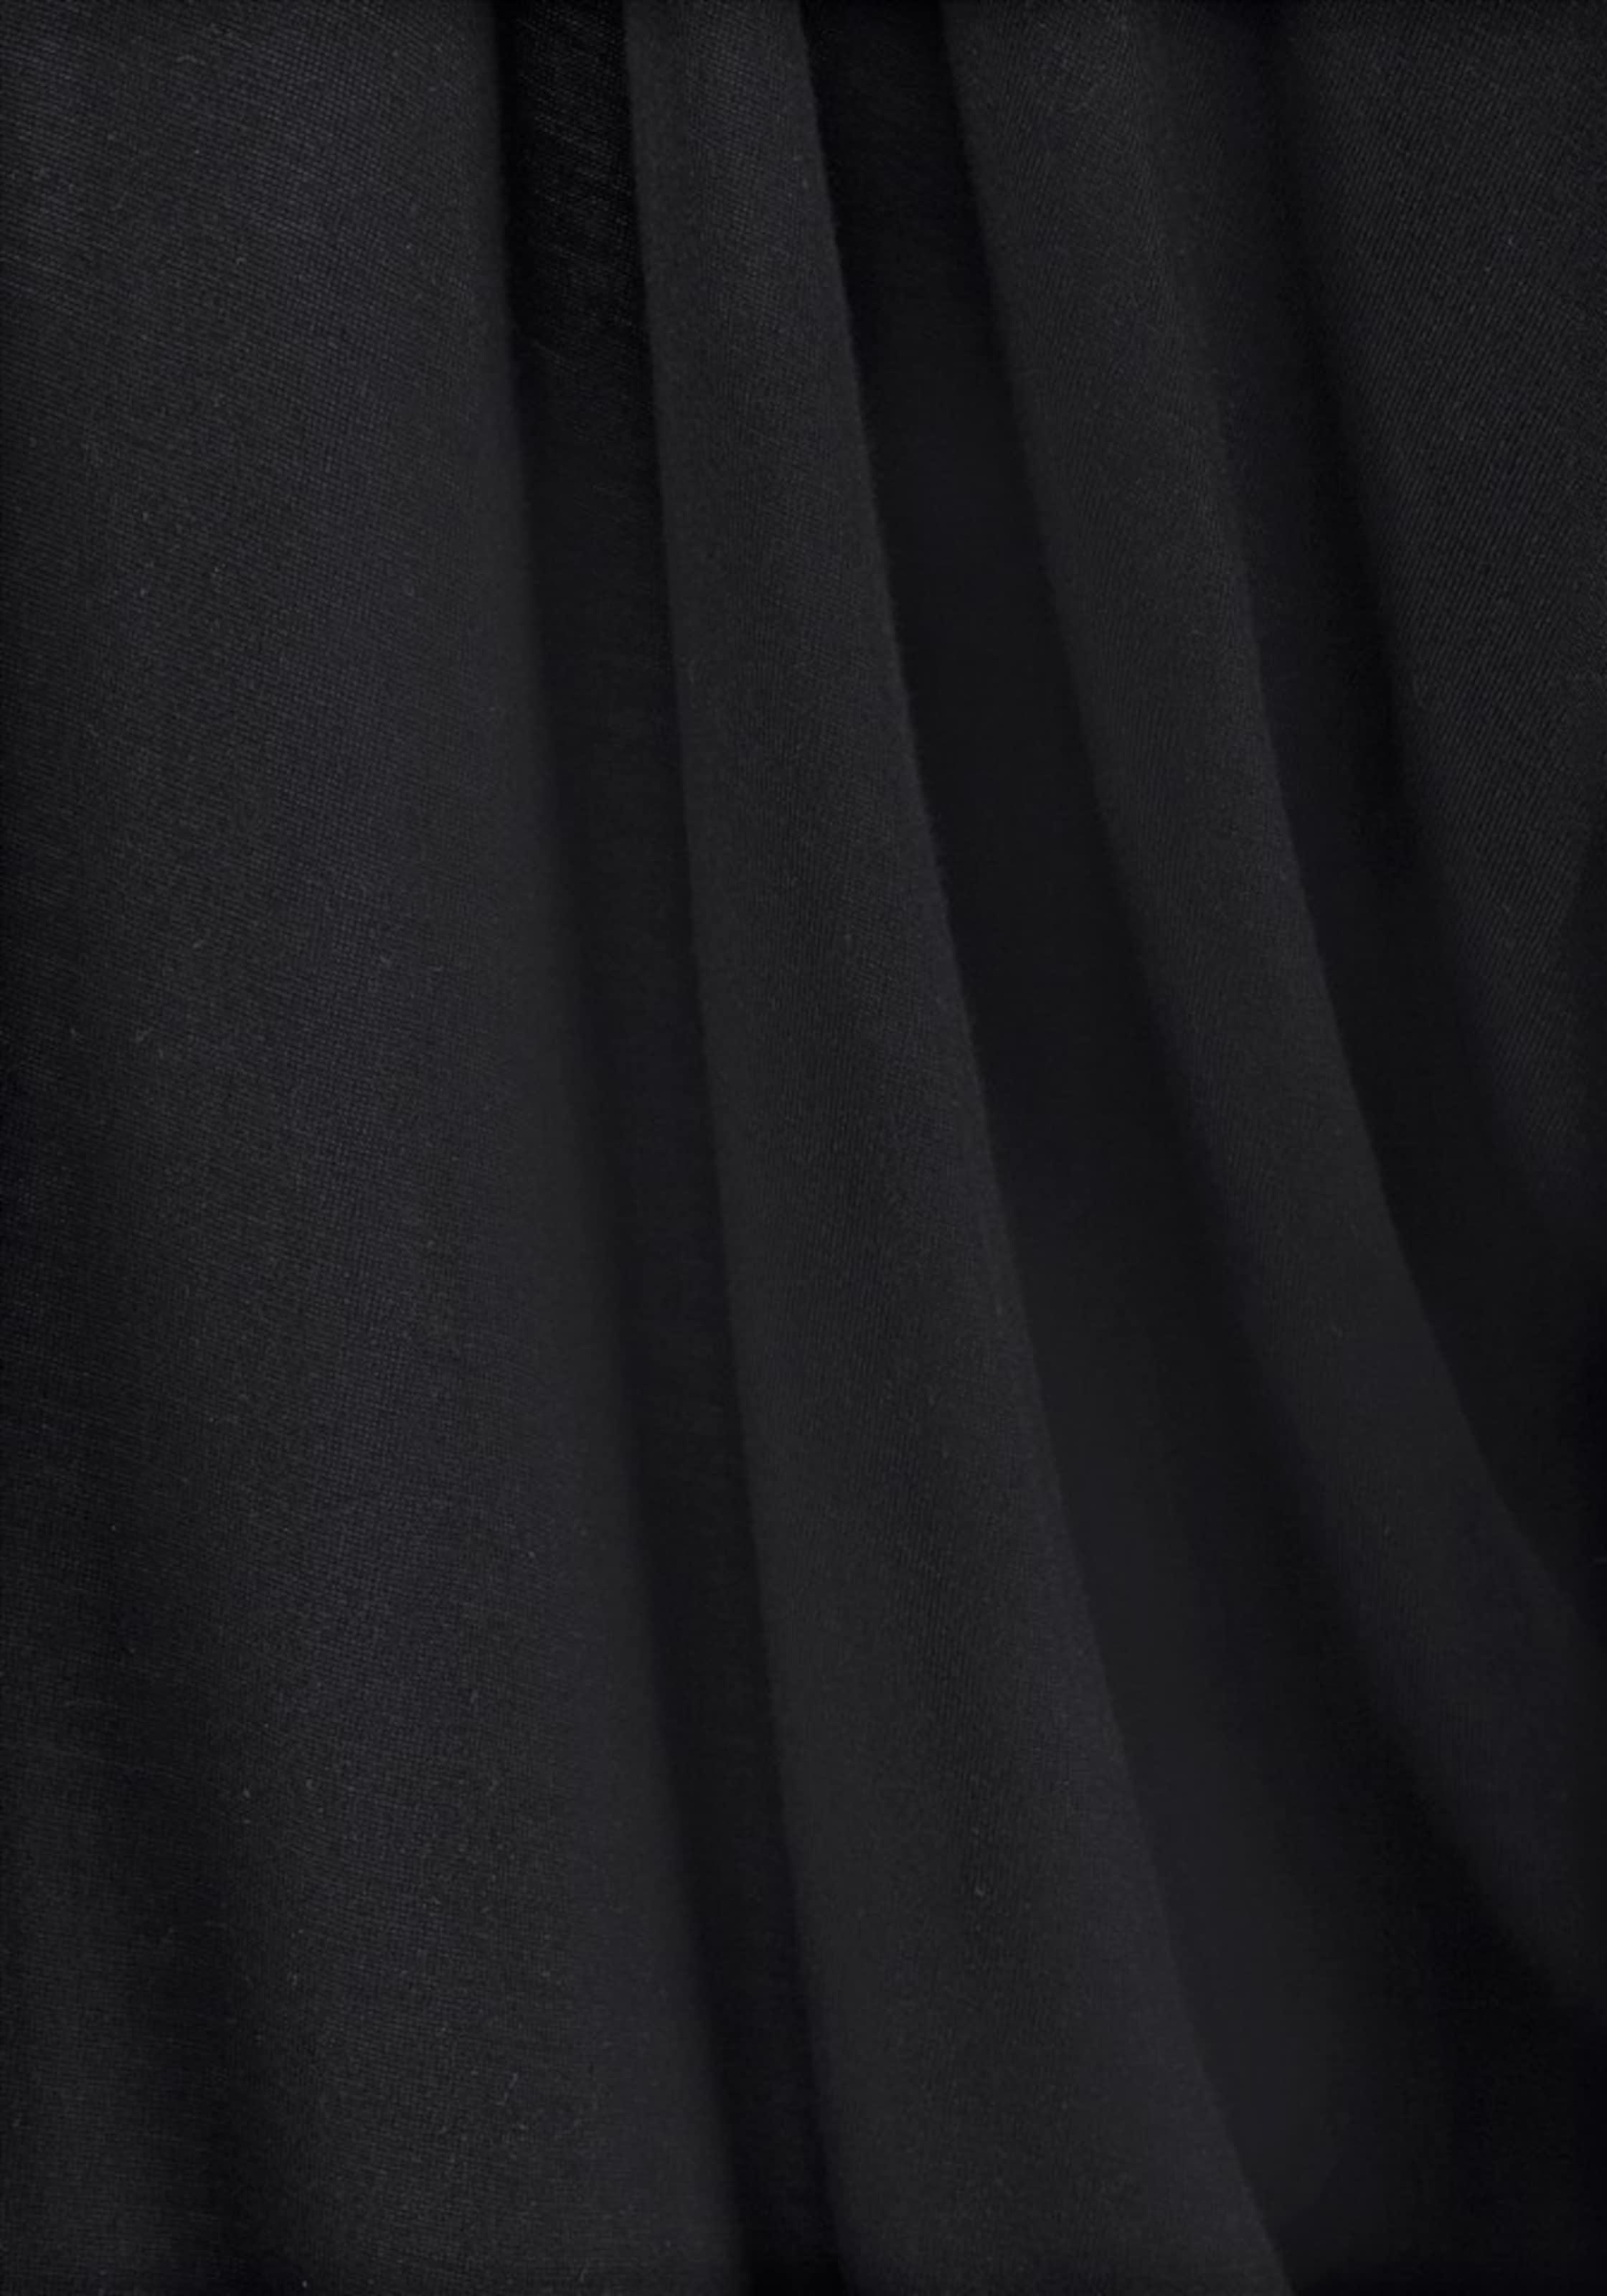 Lascana Noir Noir T shirt Lascana Lascana T shirt En T En PiXZku